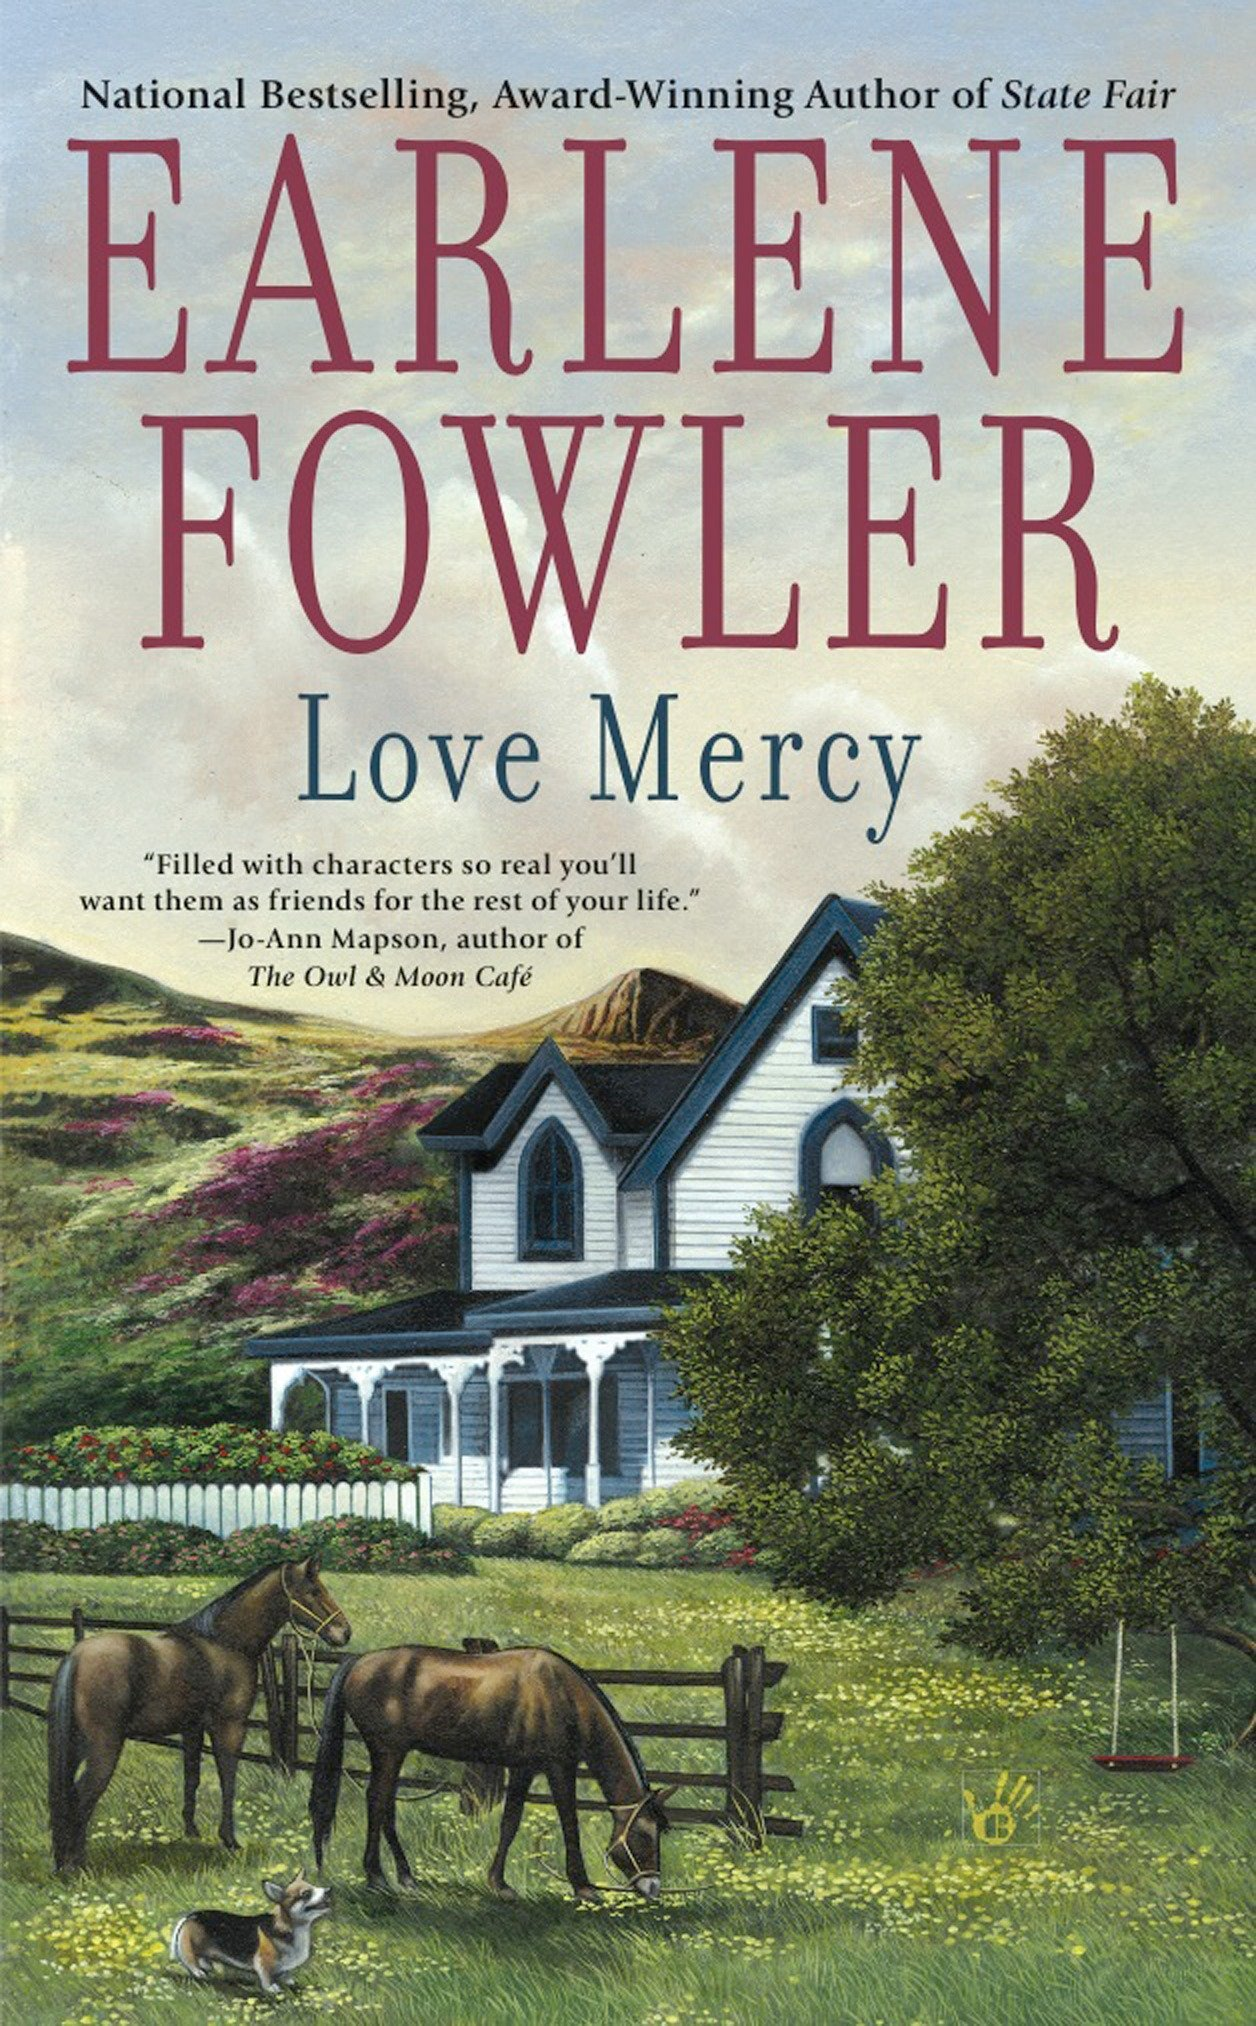 Love mercy earlene fowler 9780425233320 books amazon fandeluxe Choice Image